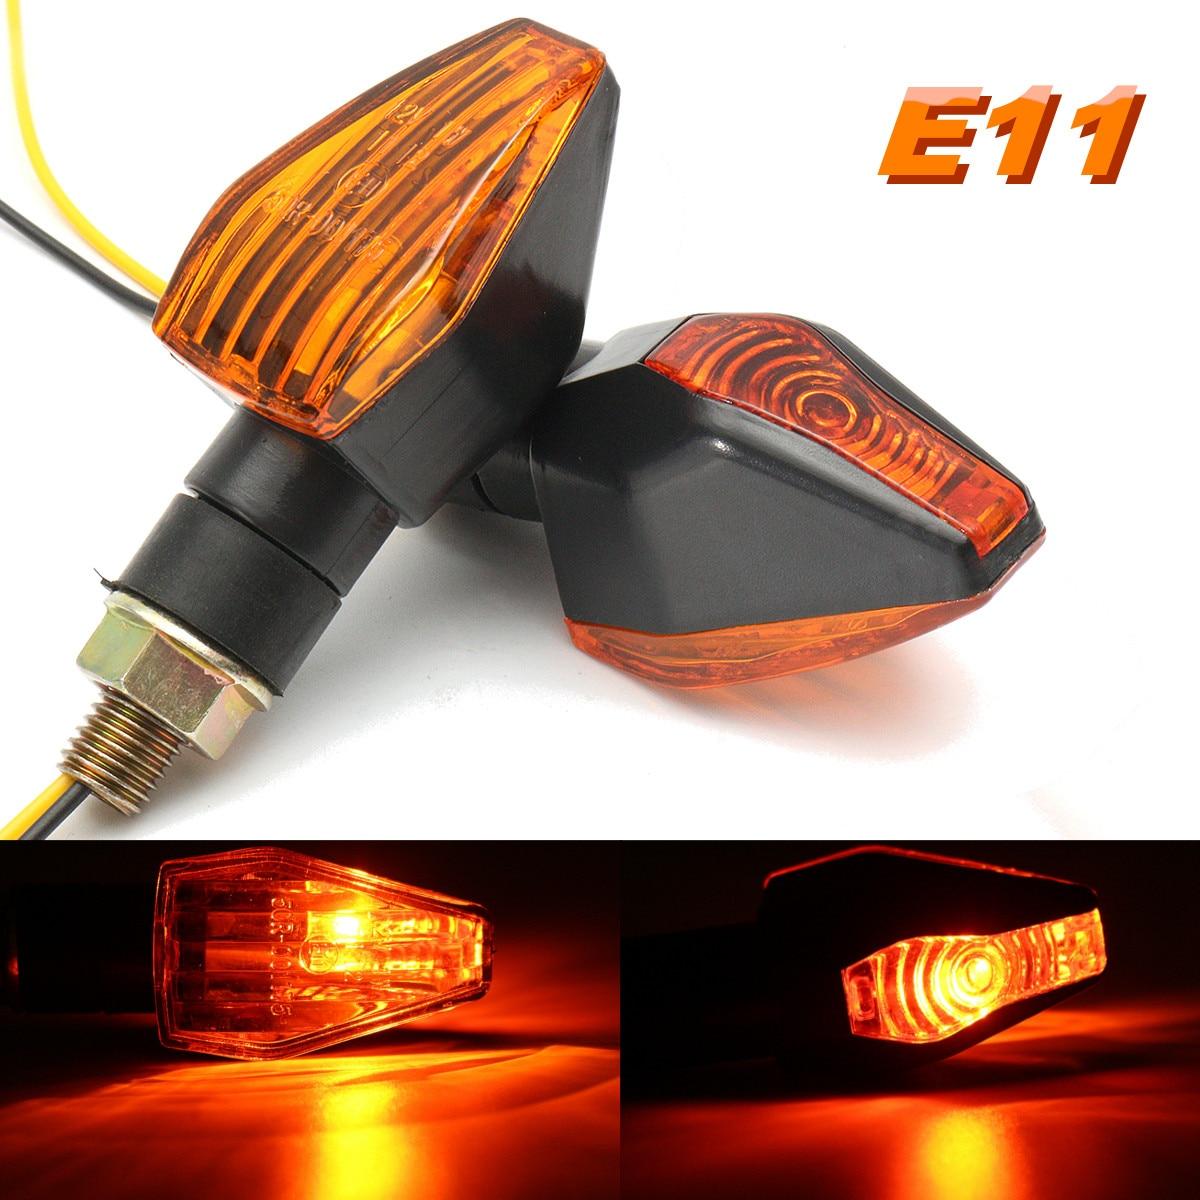 2pcs 12V Universal Motorcycle Blinker Turn Signal Indicator Light Bulb E-Marked2pcs 12V Universal Motorcycle Blinker Turn Signal Indicator Light Bulb E-Marked